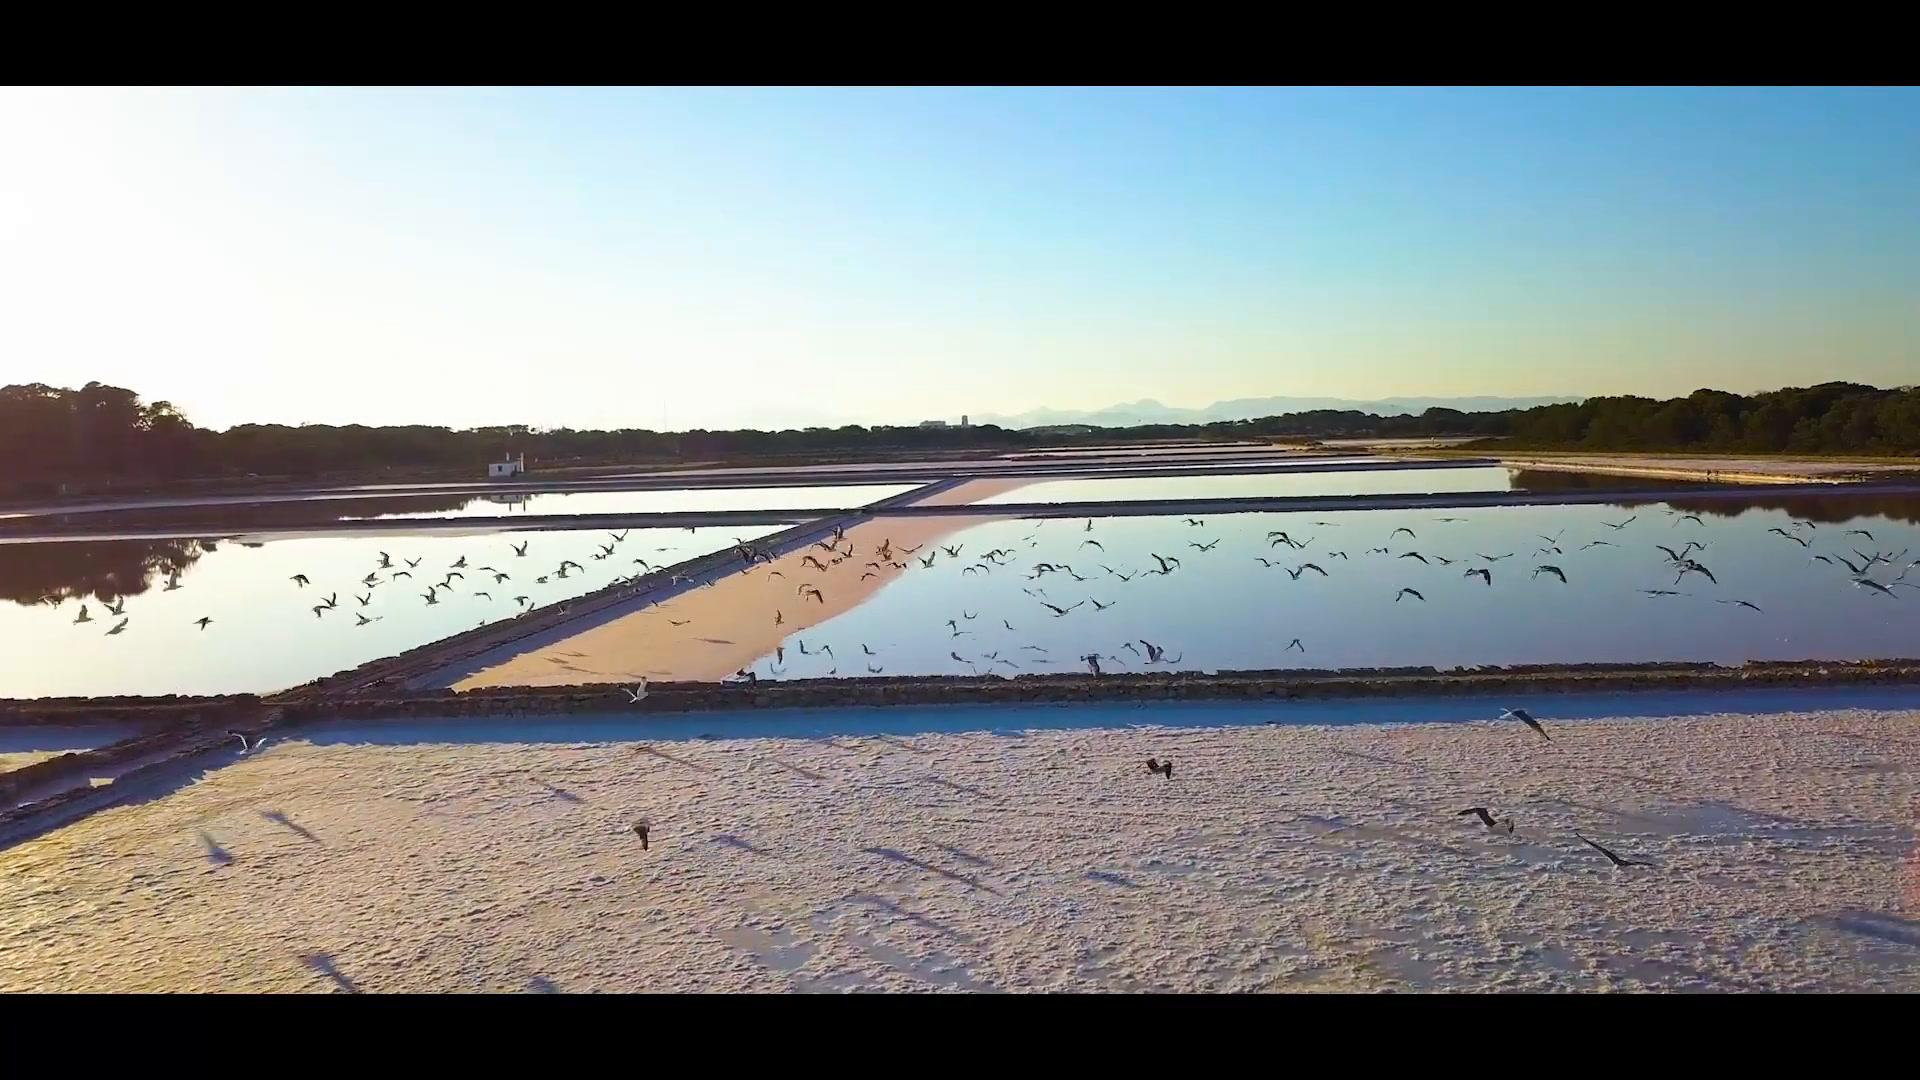 Laura + Maurizio | Formentera del Segura, Spain | Es Moli de Sal